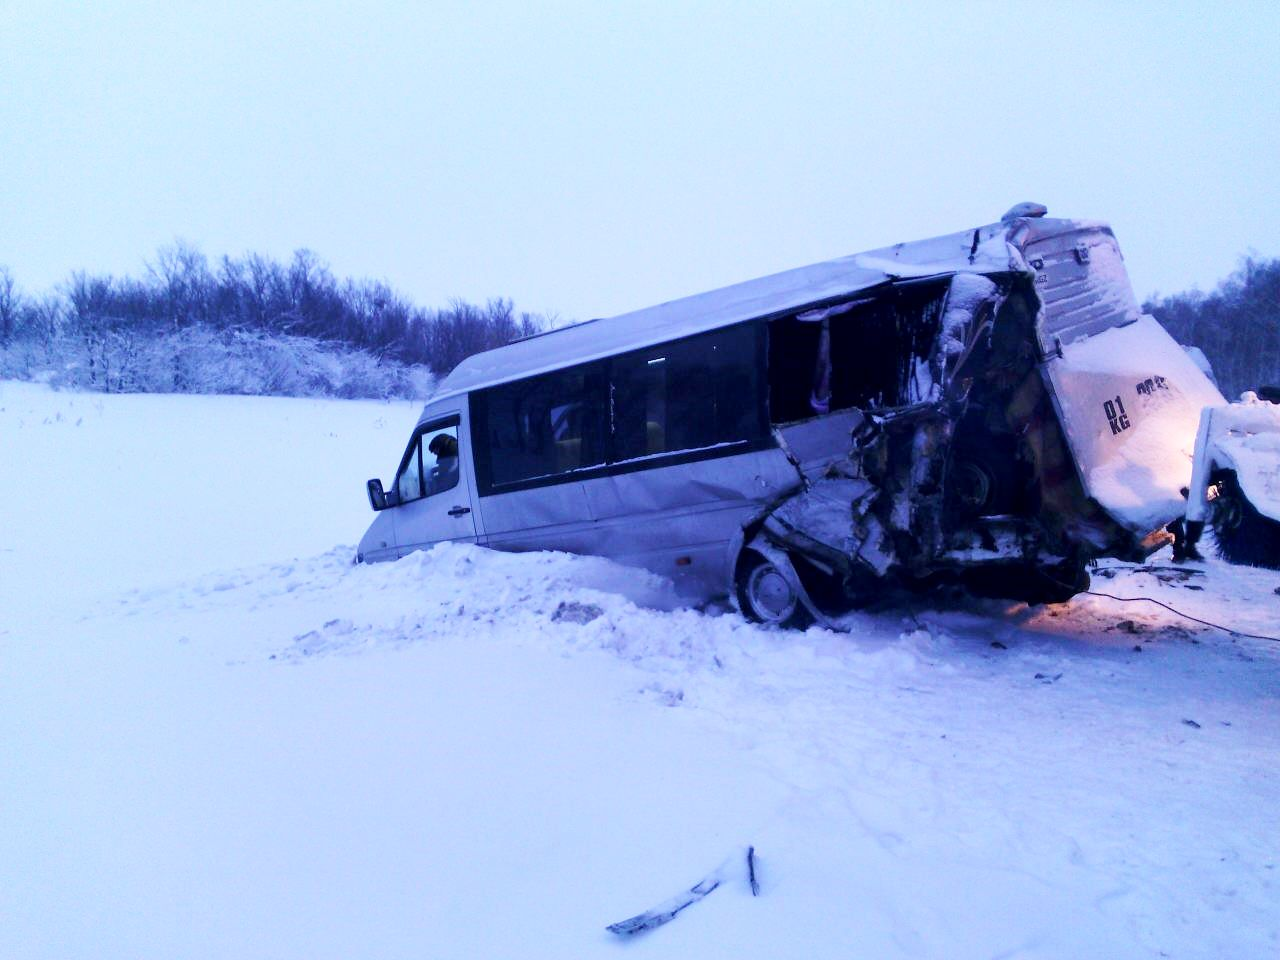 Два пассажирских автобуса столкнулись вШарлыкском районе